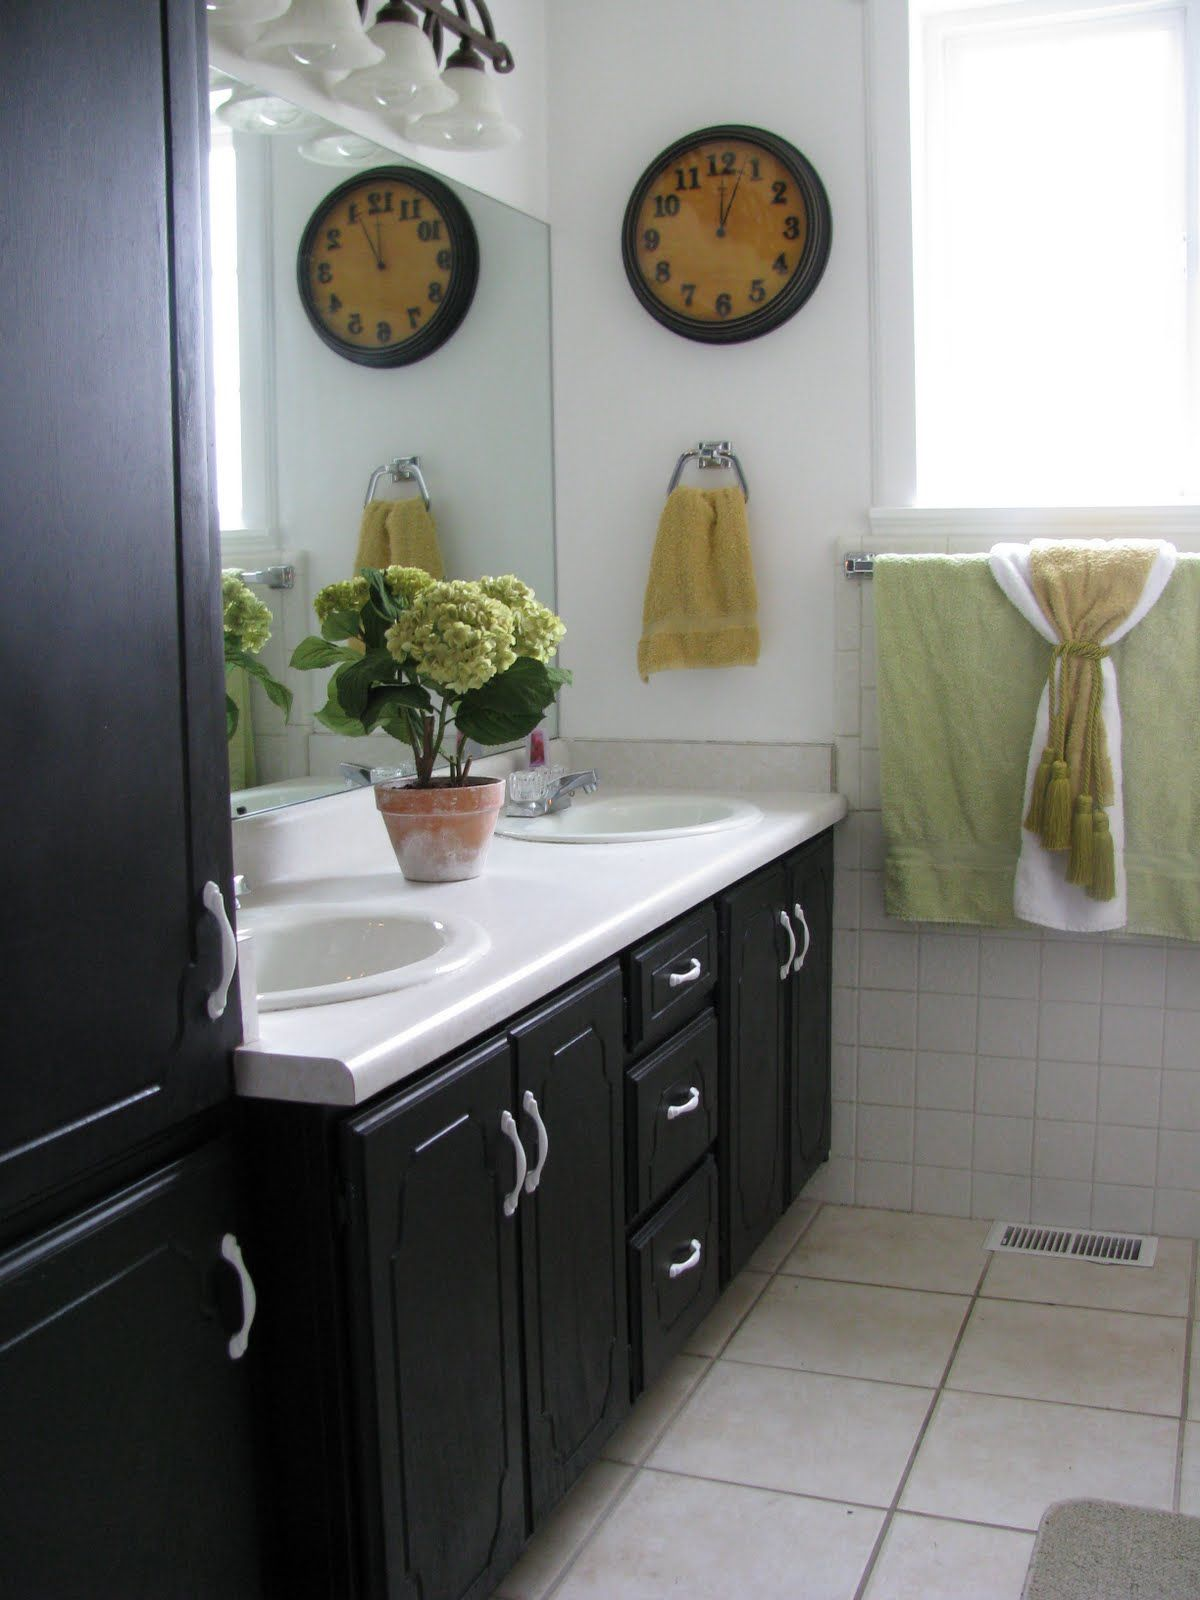 Black Painted Bathroom Cabinets Joys Of Home My Home Pinterest Painted Bathroom Cabinets